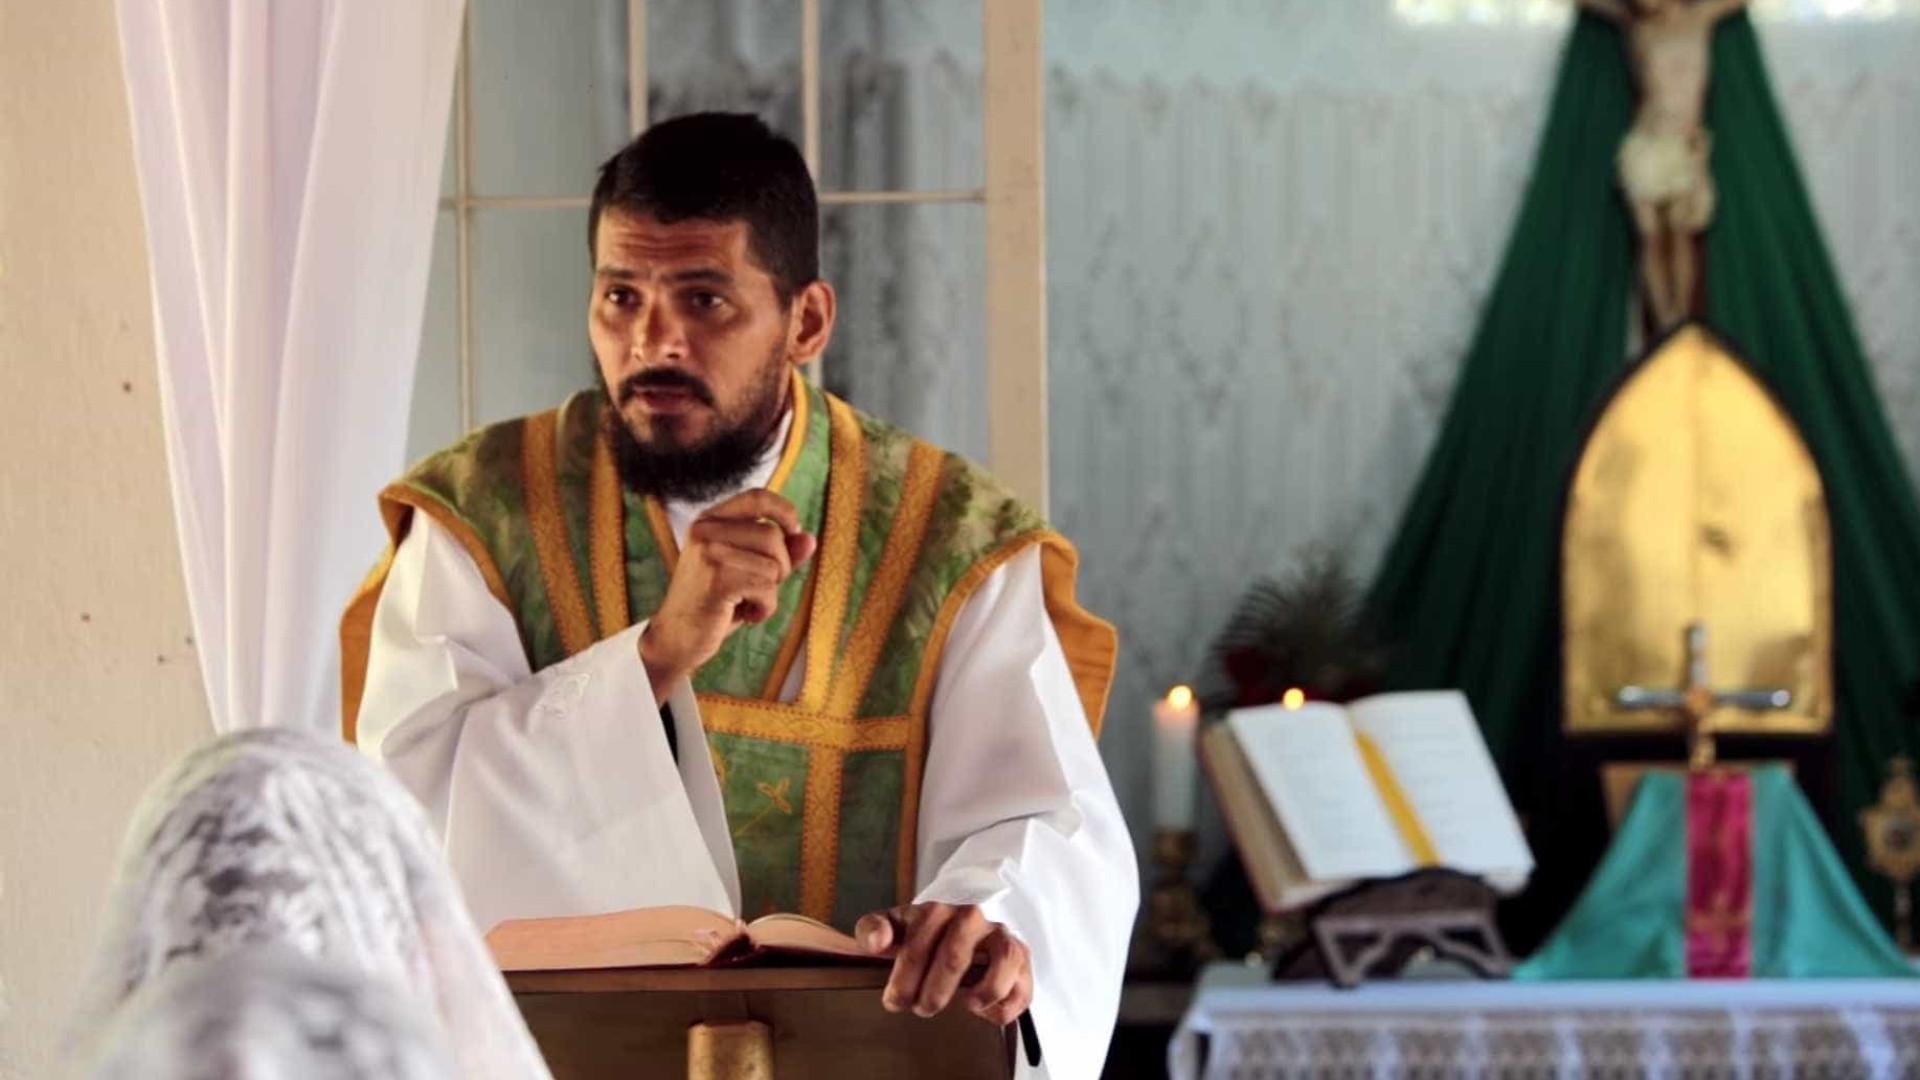 Suspeito de abuso, padre expulso da Igreja pediu votos para Bolsonaro